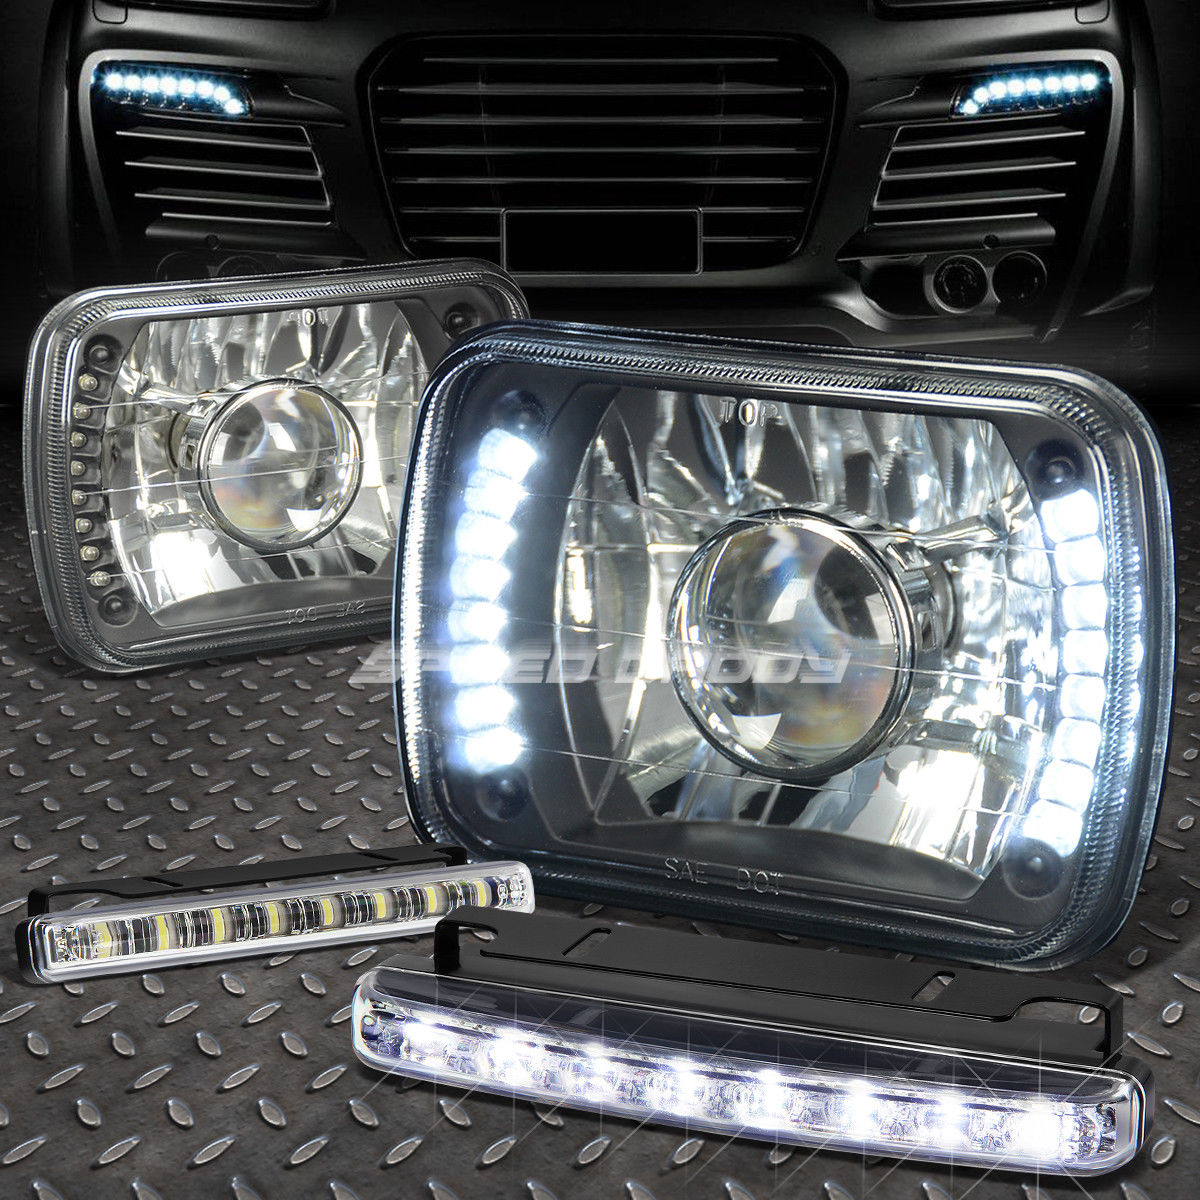 USフォグライト SQUARE/ BLACK PROJECTOR HEADLIGHT+8 FOR LED HEADLIGHT+8 LED GRILL FOG LIGHT FOR H6014/H6054 スクエアブラックプロジェクターLEDヘッドライト+ H6014/ H6054用8 LEDグリルフォグライト, アドゥラブル 輸入子供服専門店:a27f90c9 --- diadrasis.net